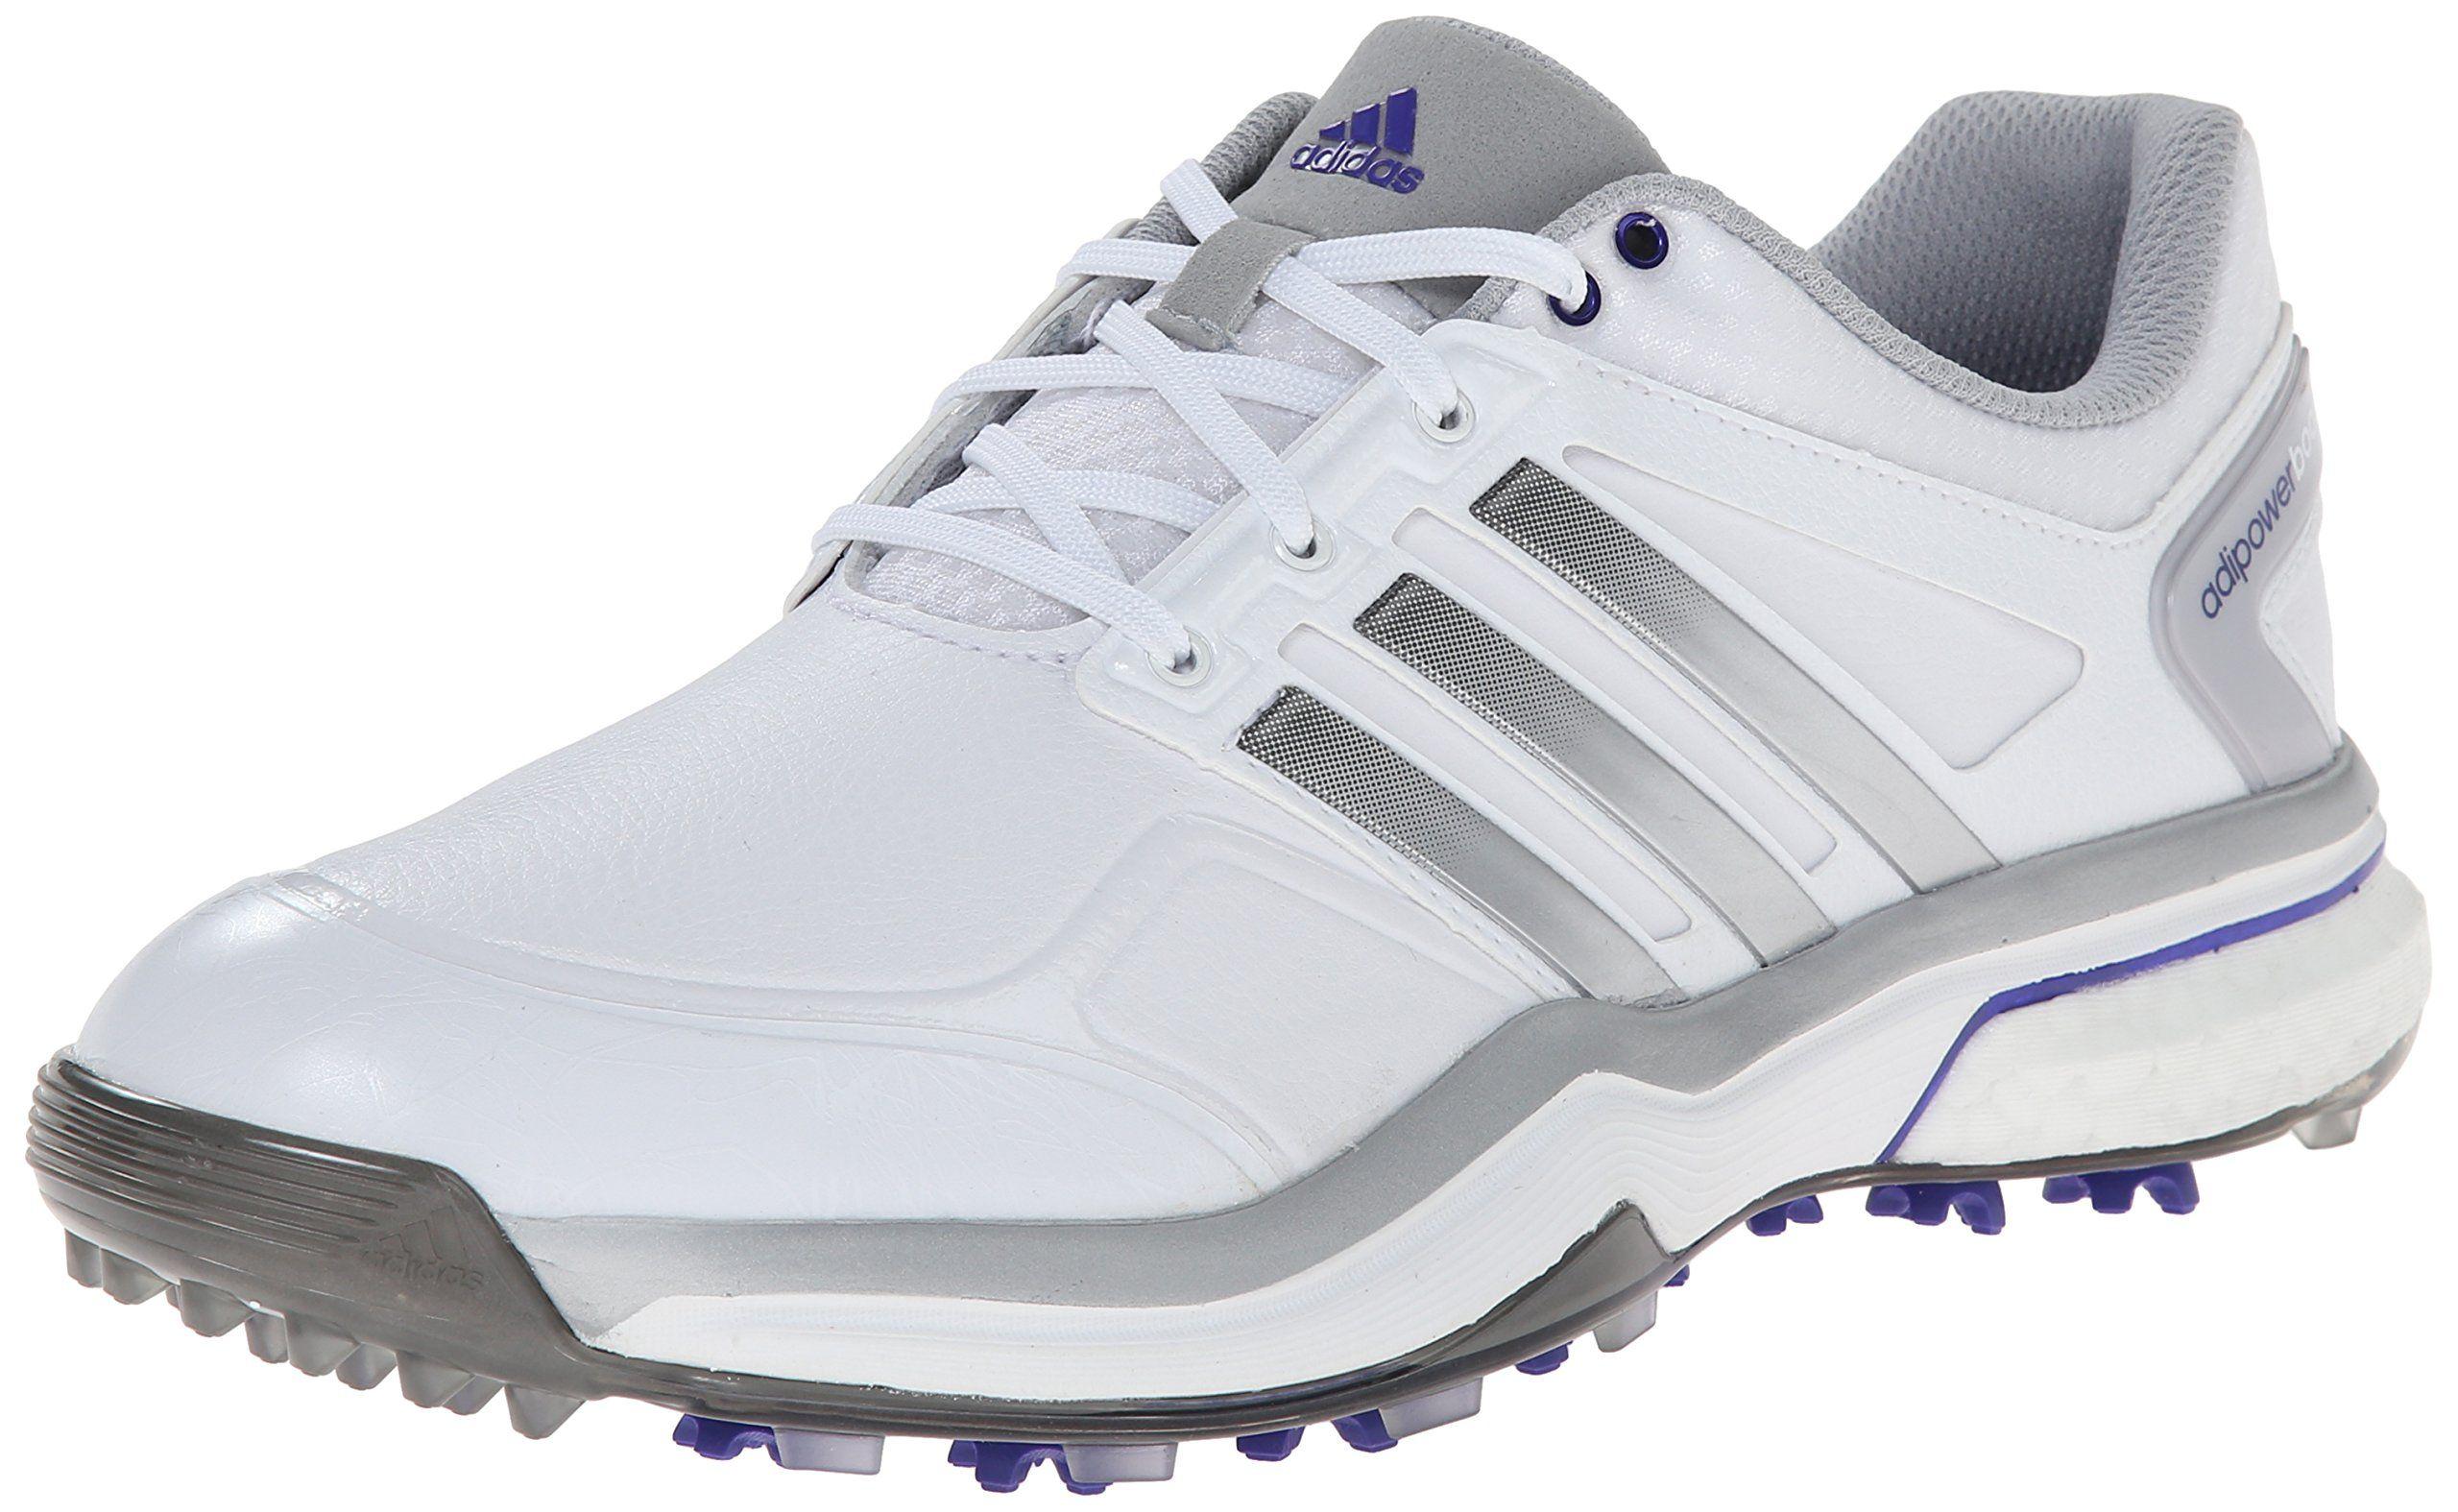 buy popular 13cf0 6dfb6 adidas Women s W Adipower Boost Golf Shoe, Running White Silver  Metallic Flash Purple, 6 M US